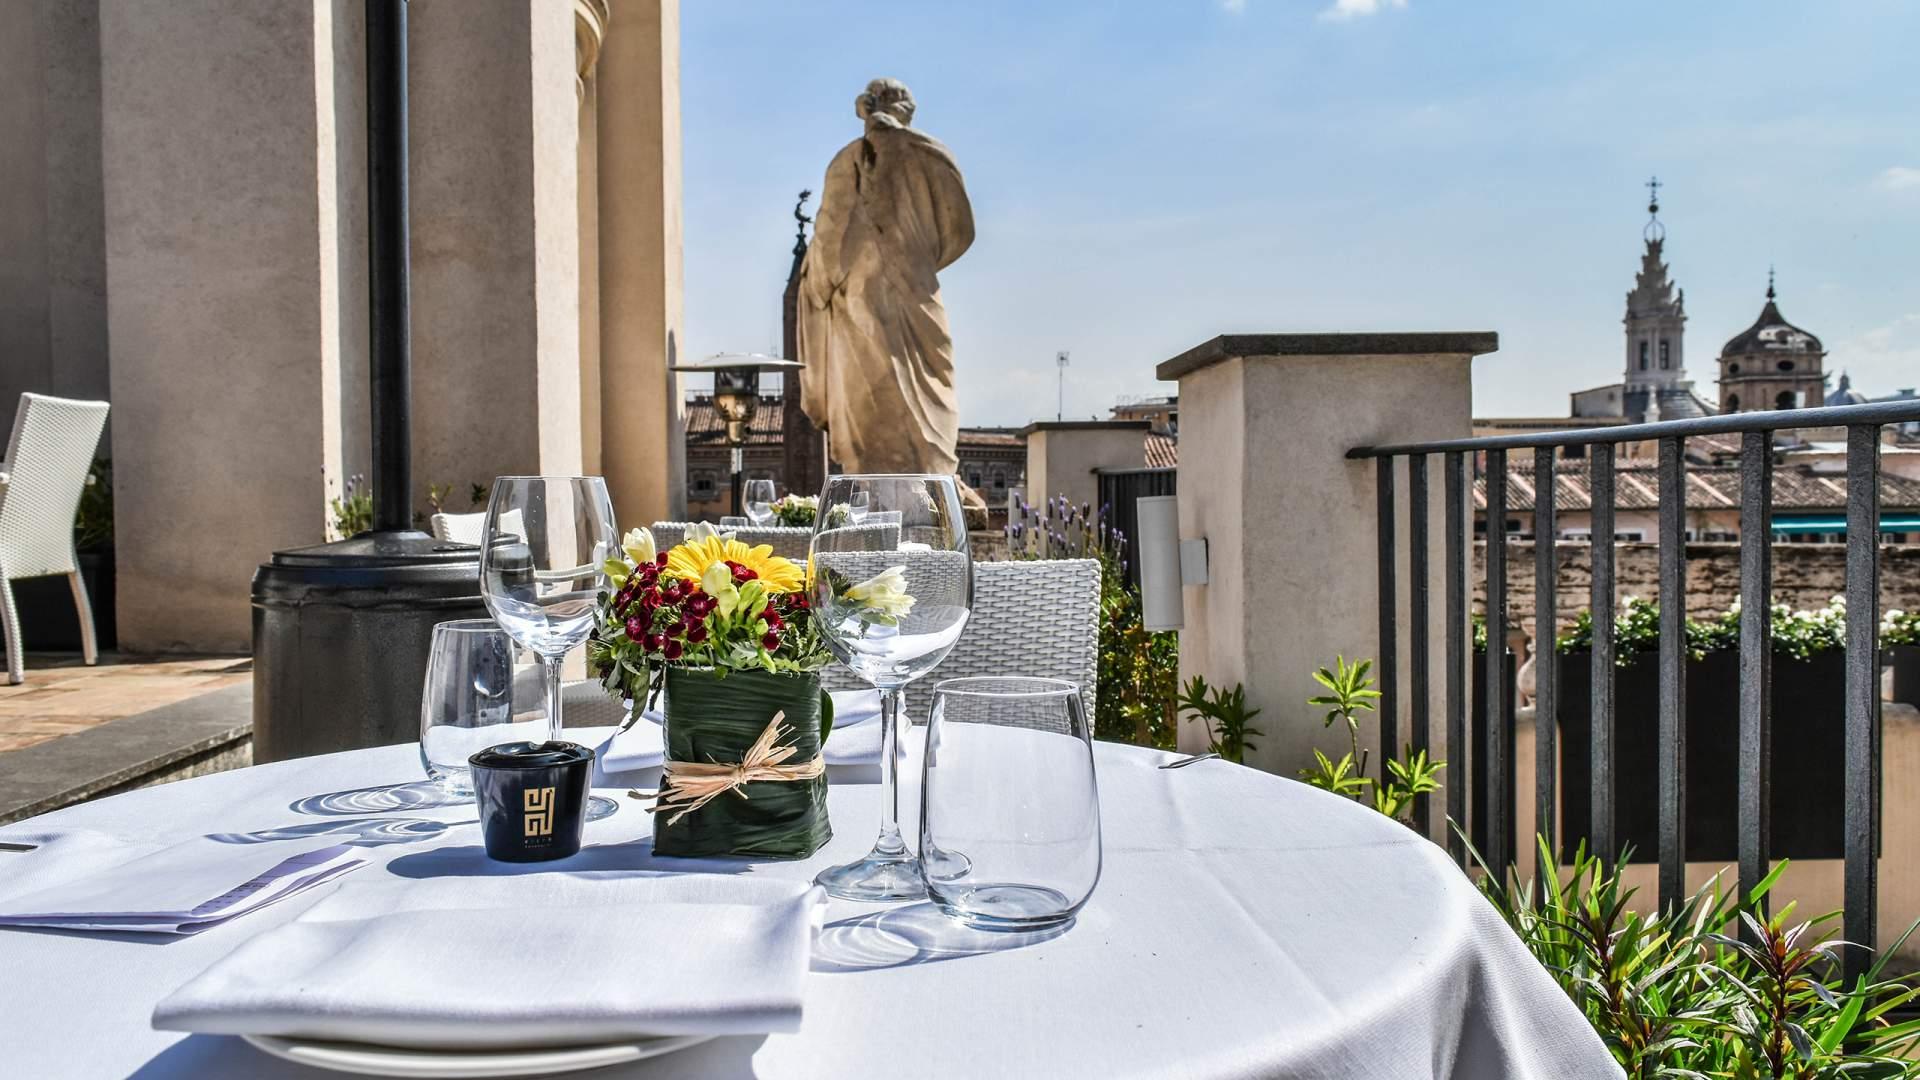 Hotel-Eitch-Borromini-Rome-restaurant-39